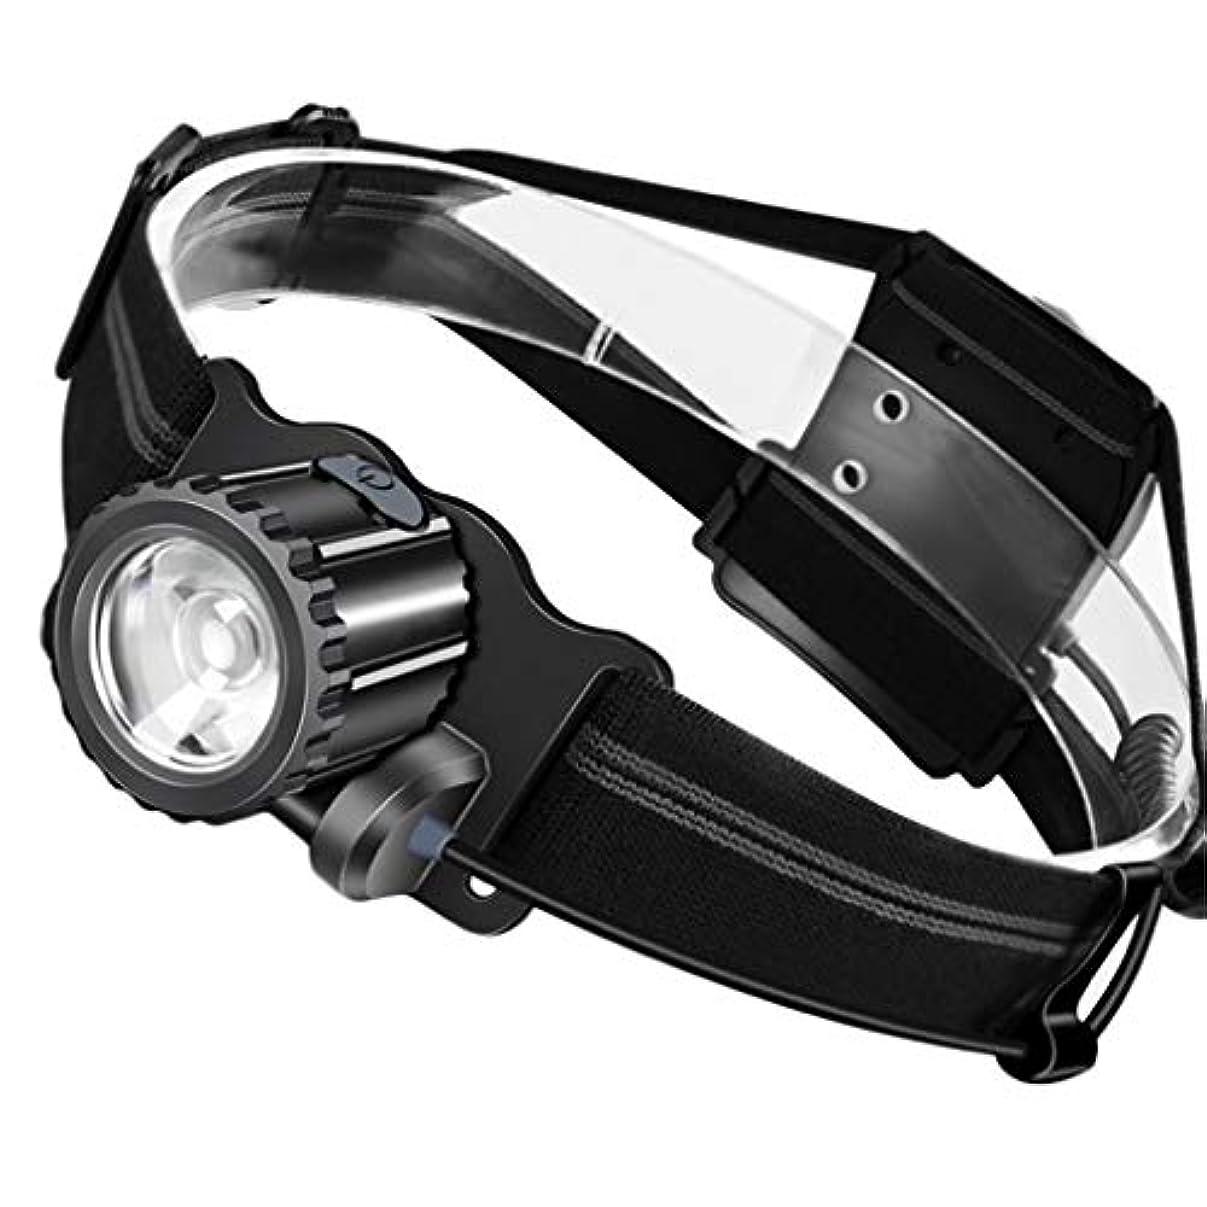 Continuous ヘッドライト、釣りライトサーチライトスーパーブライト防水LEDランタン懐中電灯用マイナー緊急事態キャンプハイキング Long service life (色 : 800 lumens)